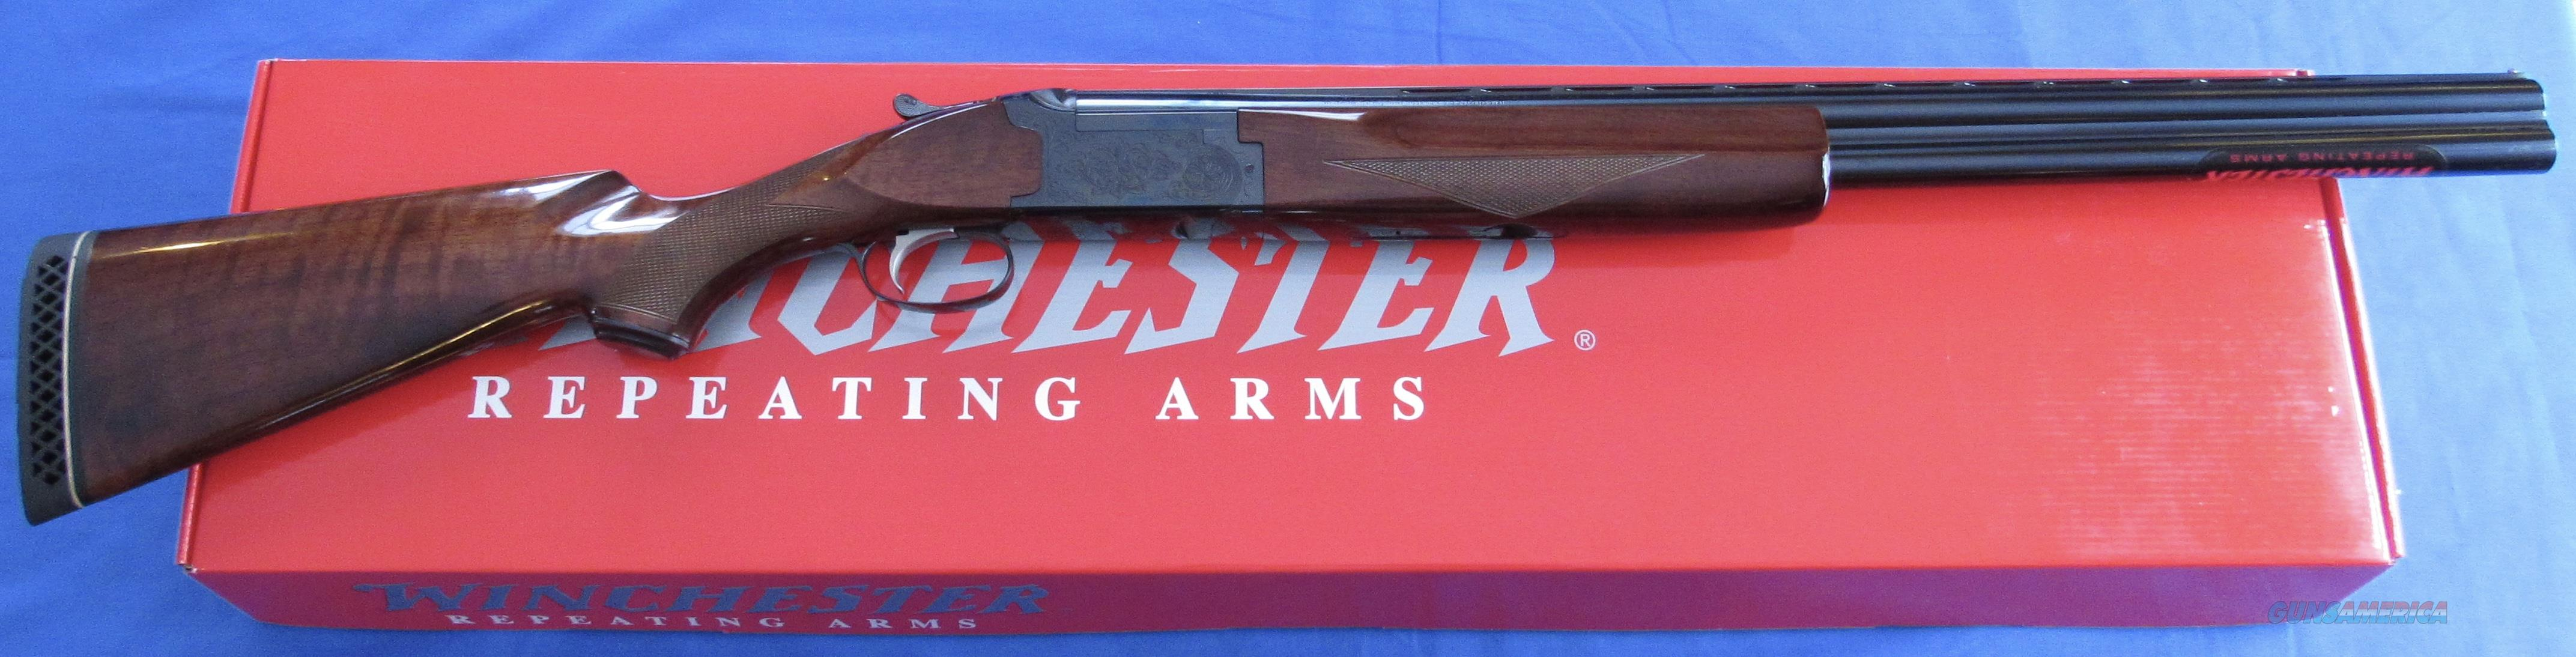 WINCHESTER 101 FIELD 12 GAUGE OVER/UNDER SHOTGUN  Guns > Shotguns > Winchester Shotguns - Modern > O/U > Hunting